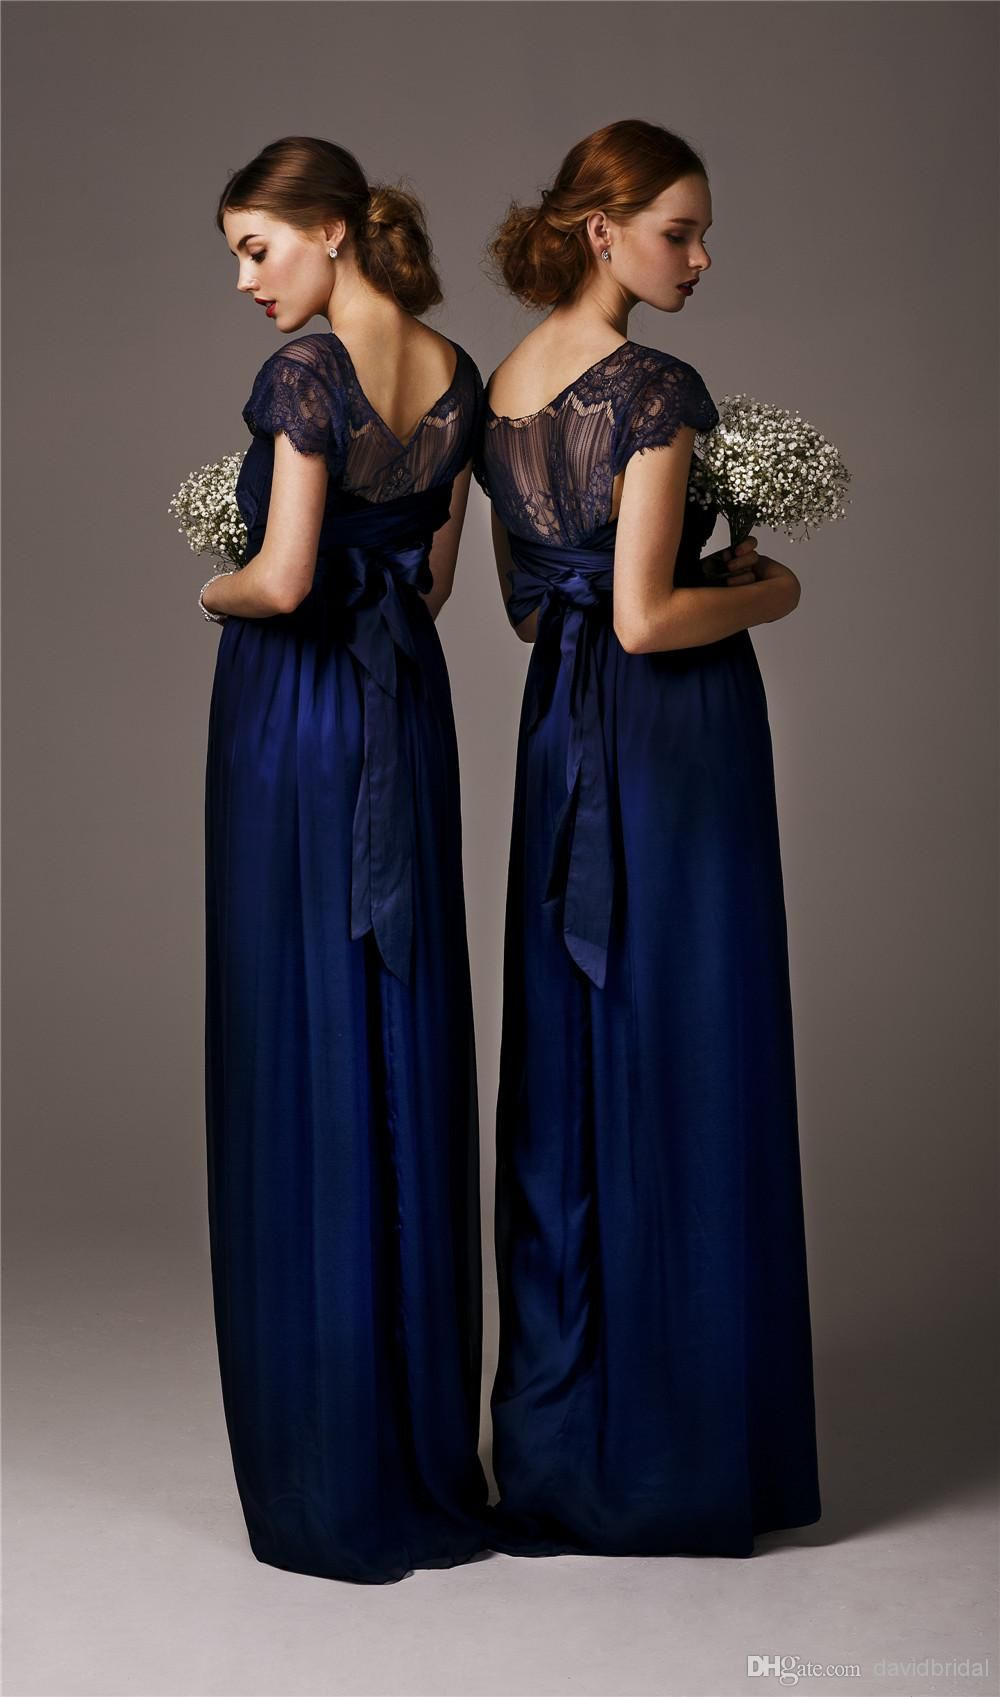 most popular lace applique dark blue bridesmaid dresses with